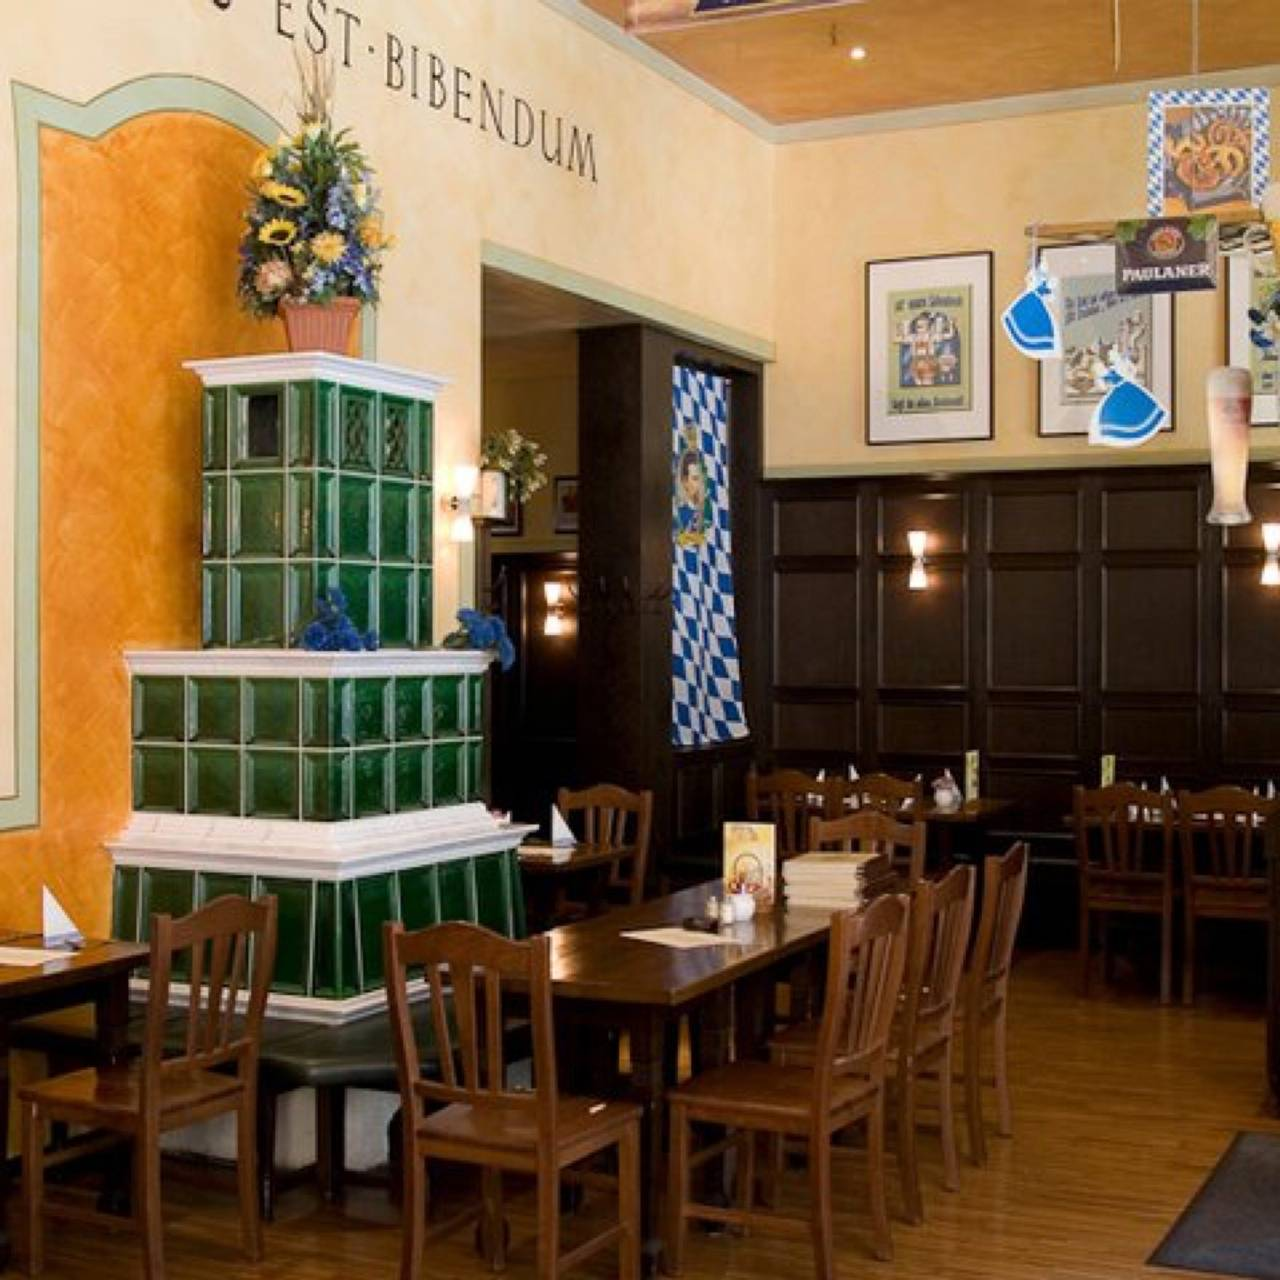 Restaurant Maximilians Berlin   Speisen Wie In Bayern   Berlin,   OpenTable